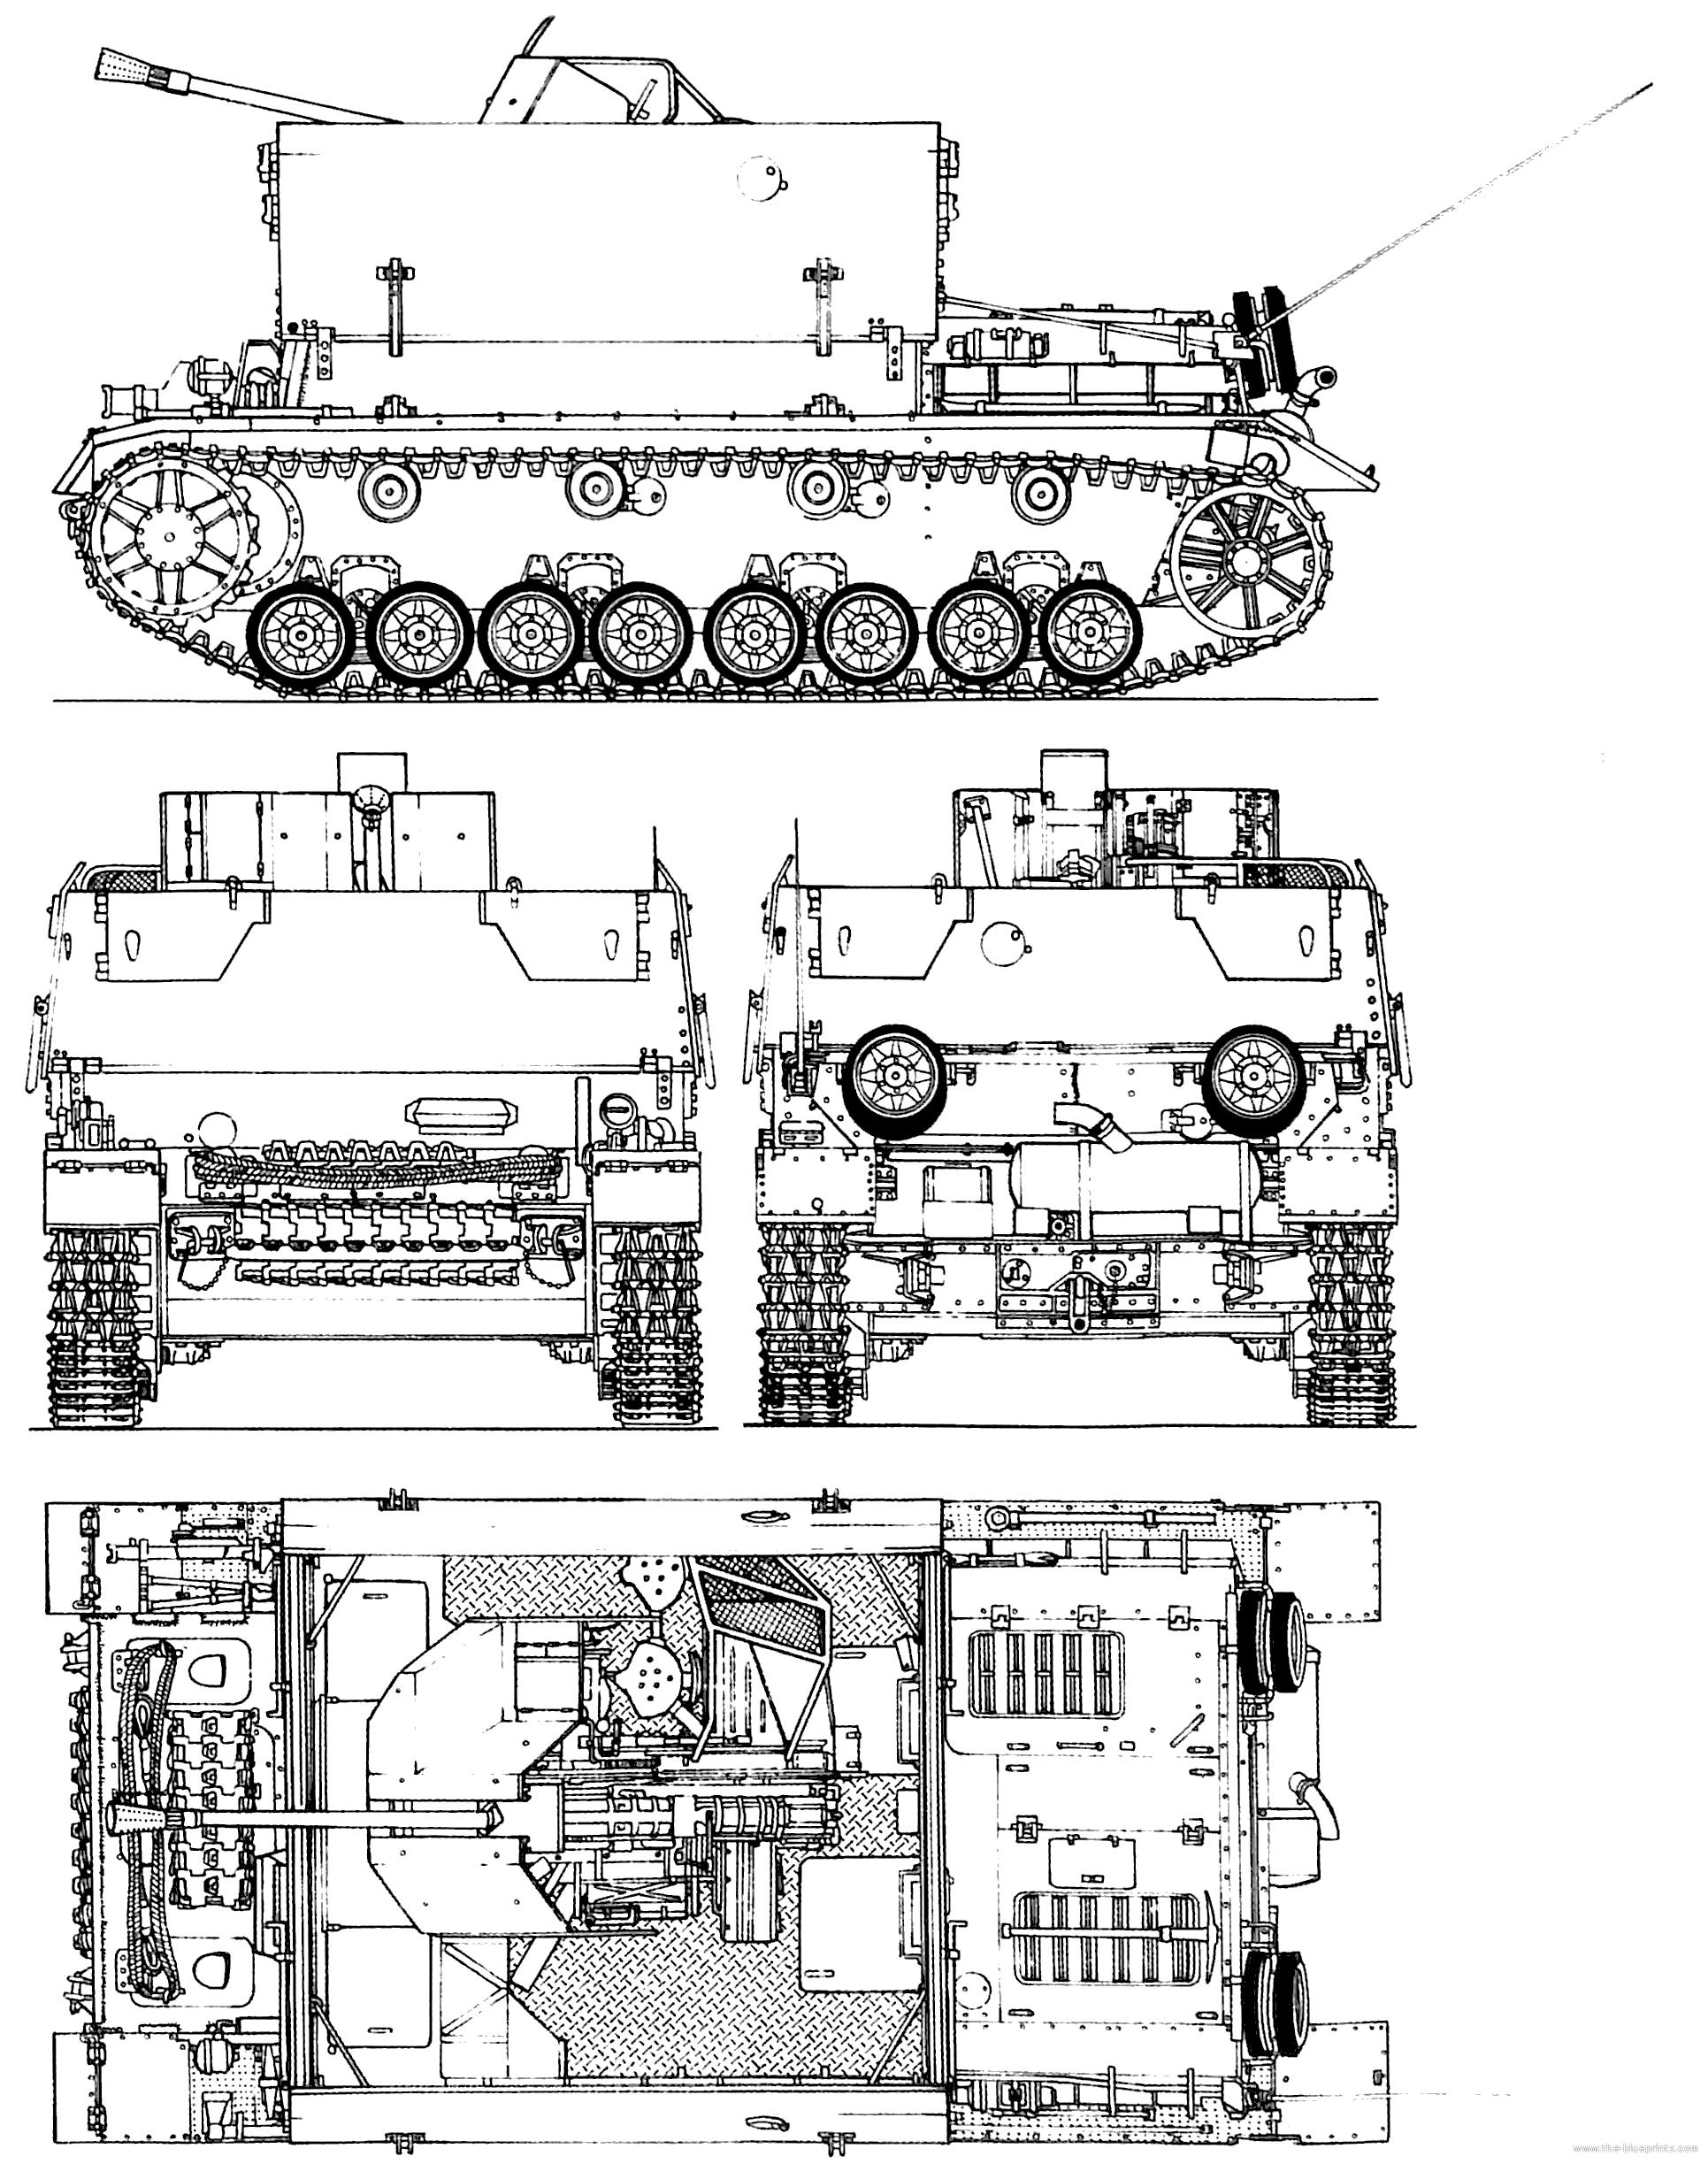 Sd Kfz 161 3 Flakpanzer Iv Mobelwagen 3 7cm Flak 43